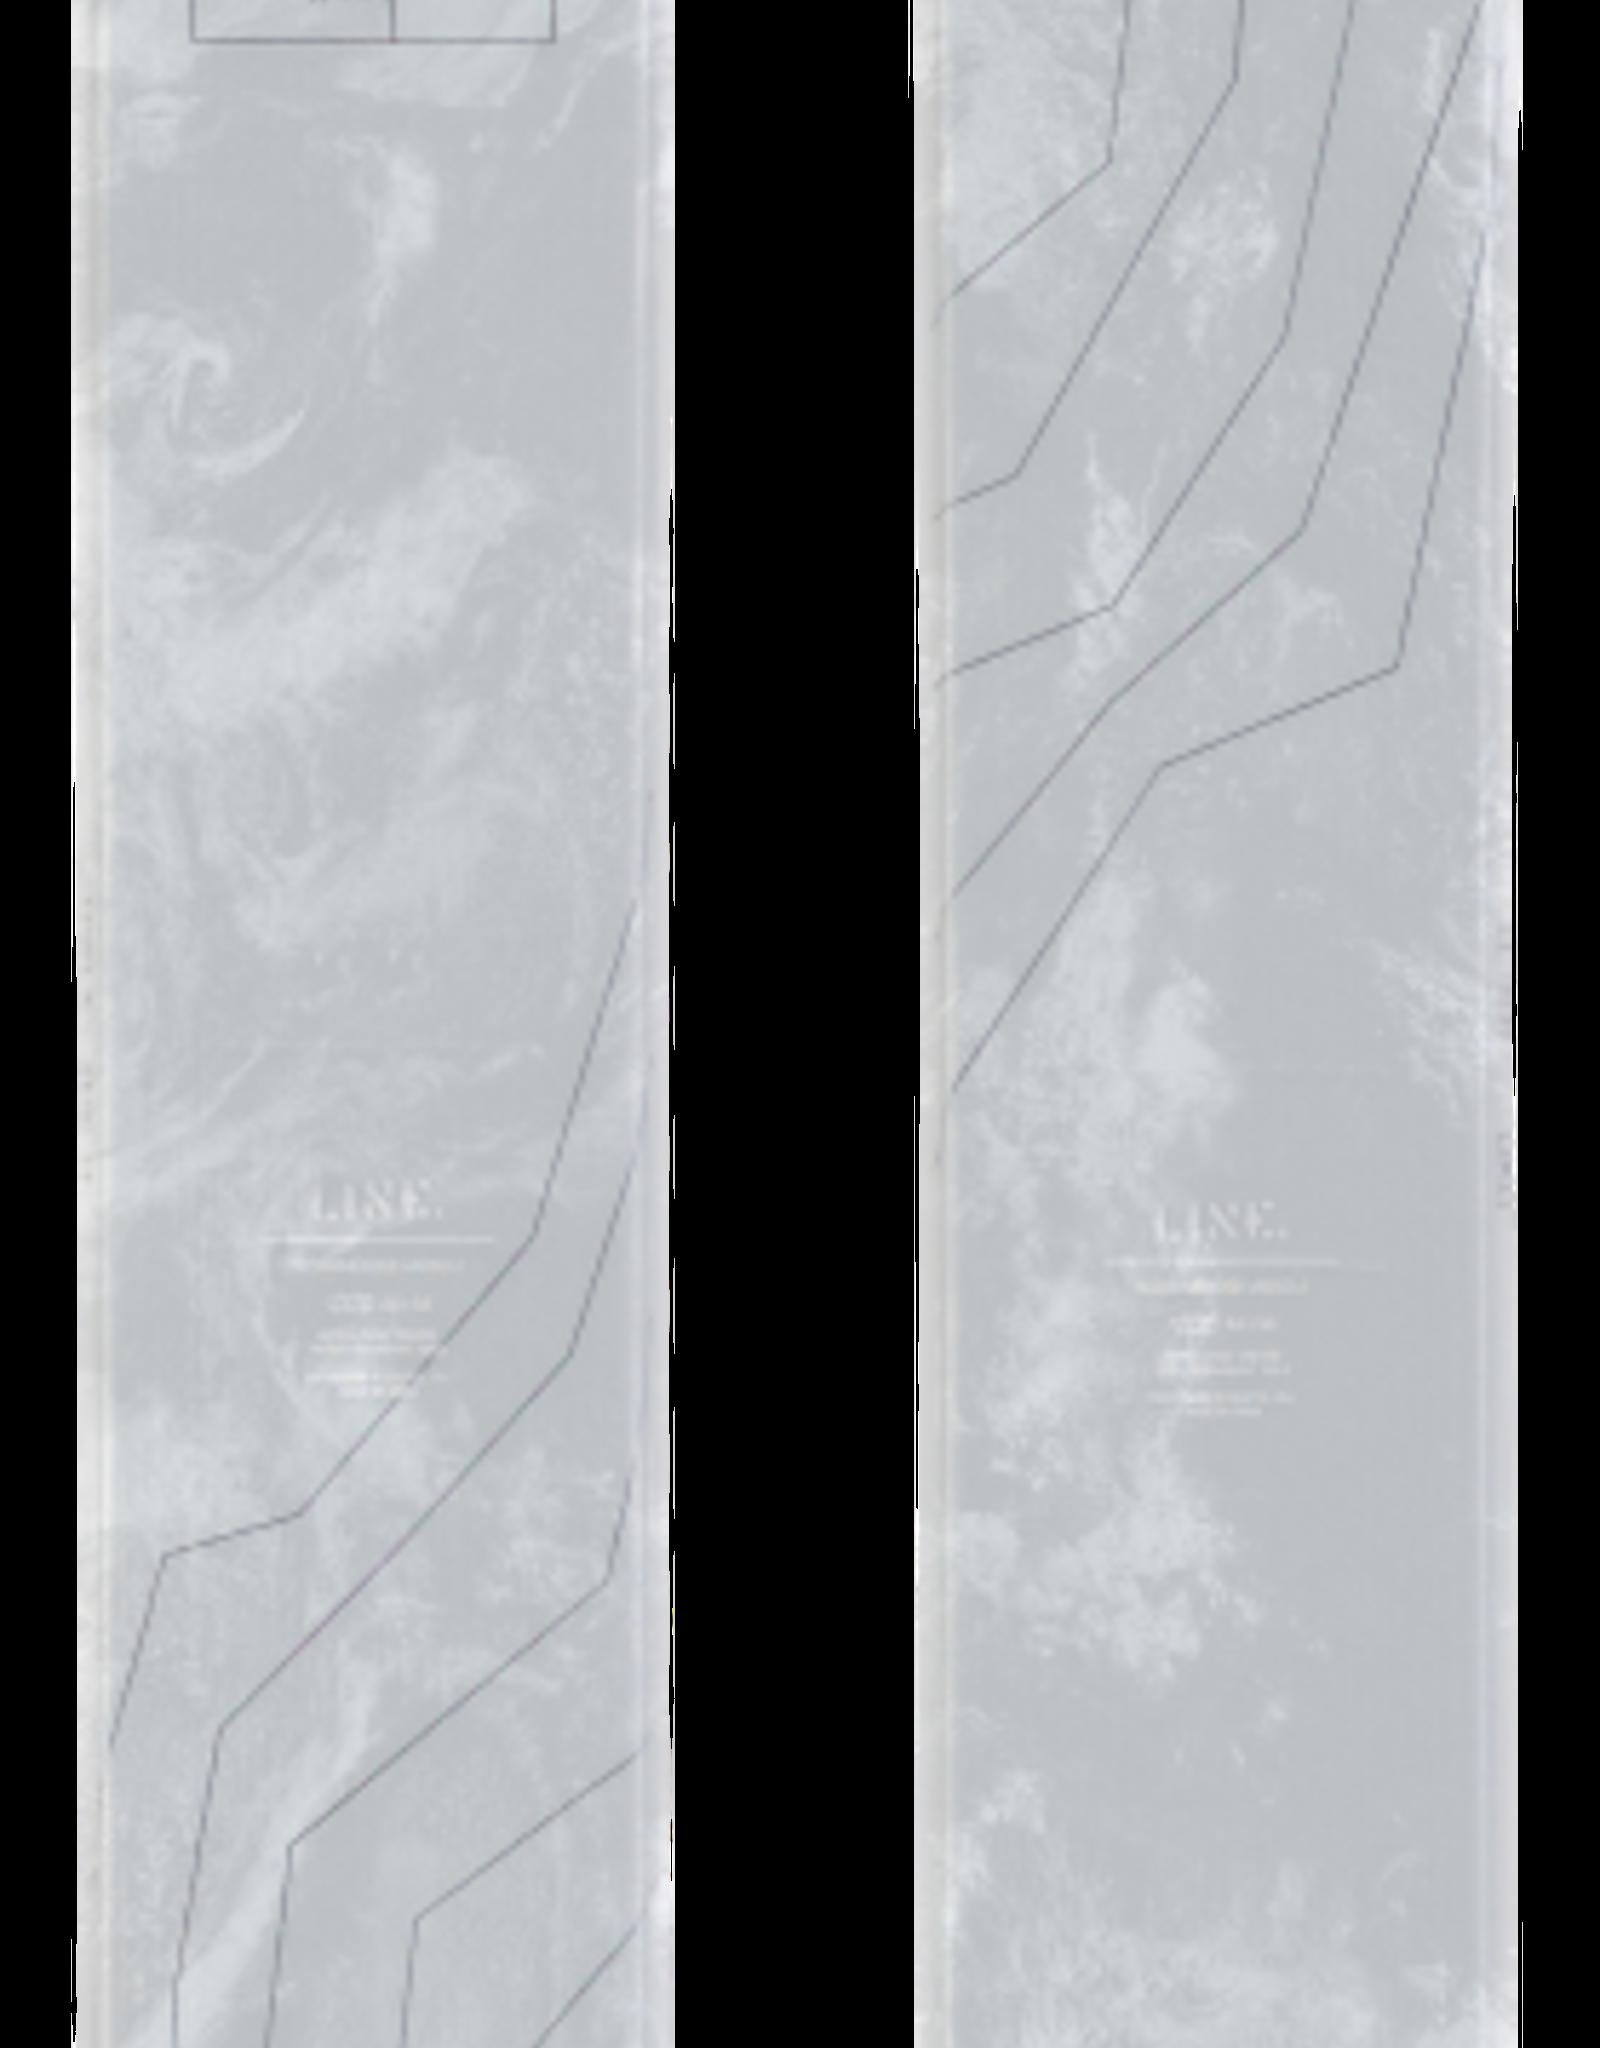 LINE LINE - TOM WALLISCH PRO (2020) - 157cm